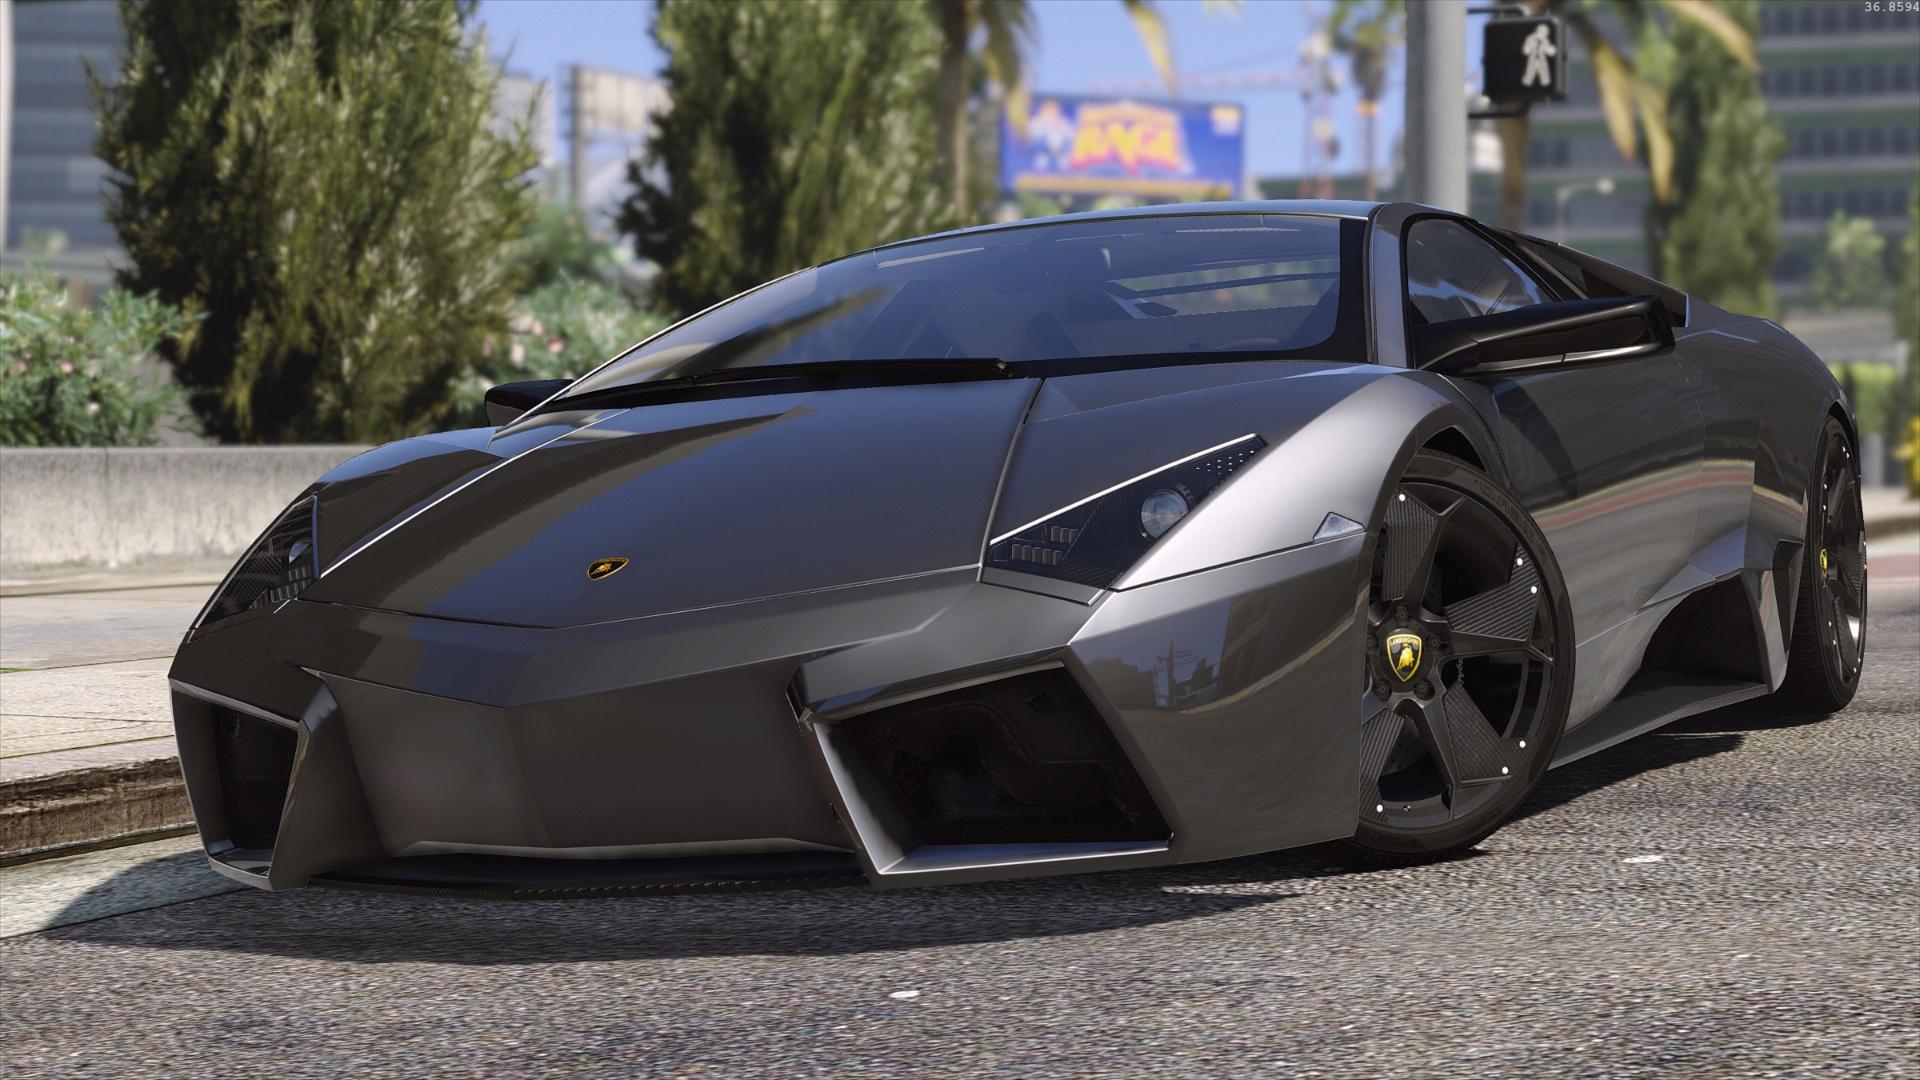 Supersport Hq Cars Pack By Scrat Gta5 Mods Com